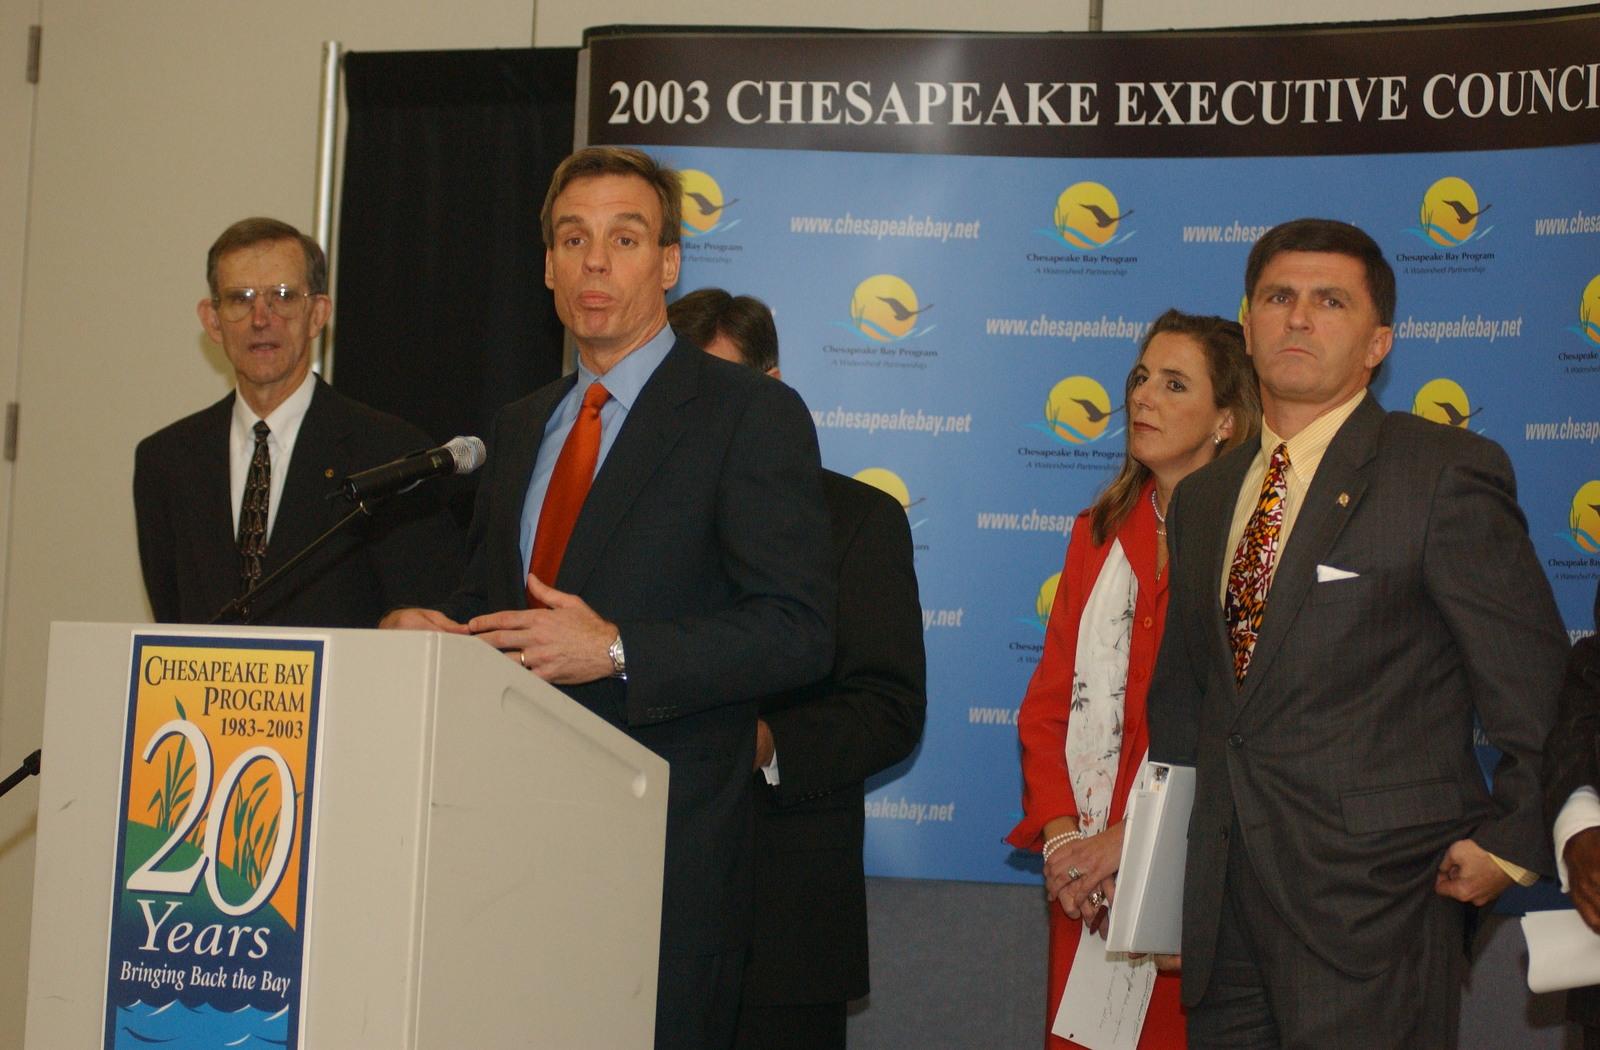 2003 Chesapeake Bay shoot - Executive Council meeting [412-APD-A167-IMAGE303.JPG]